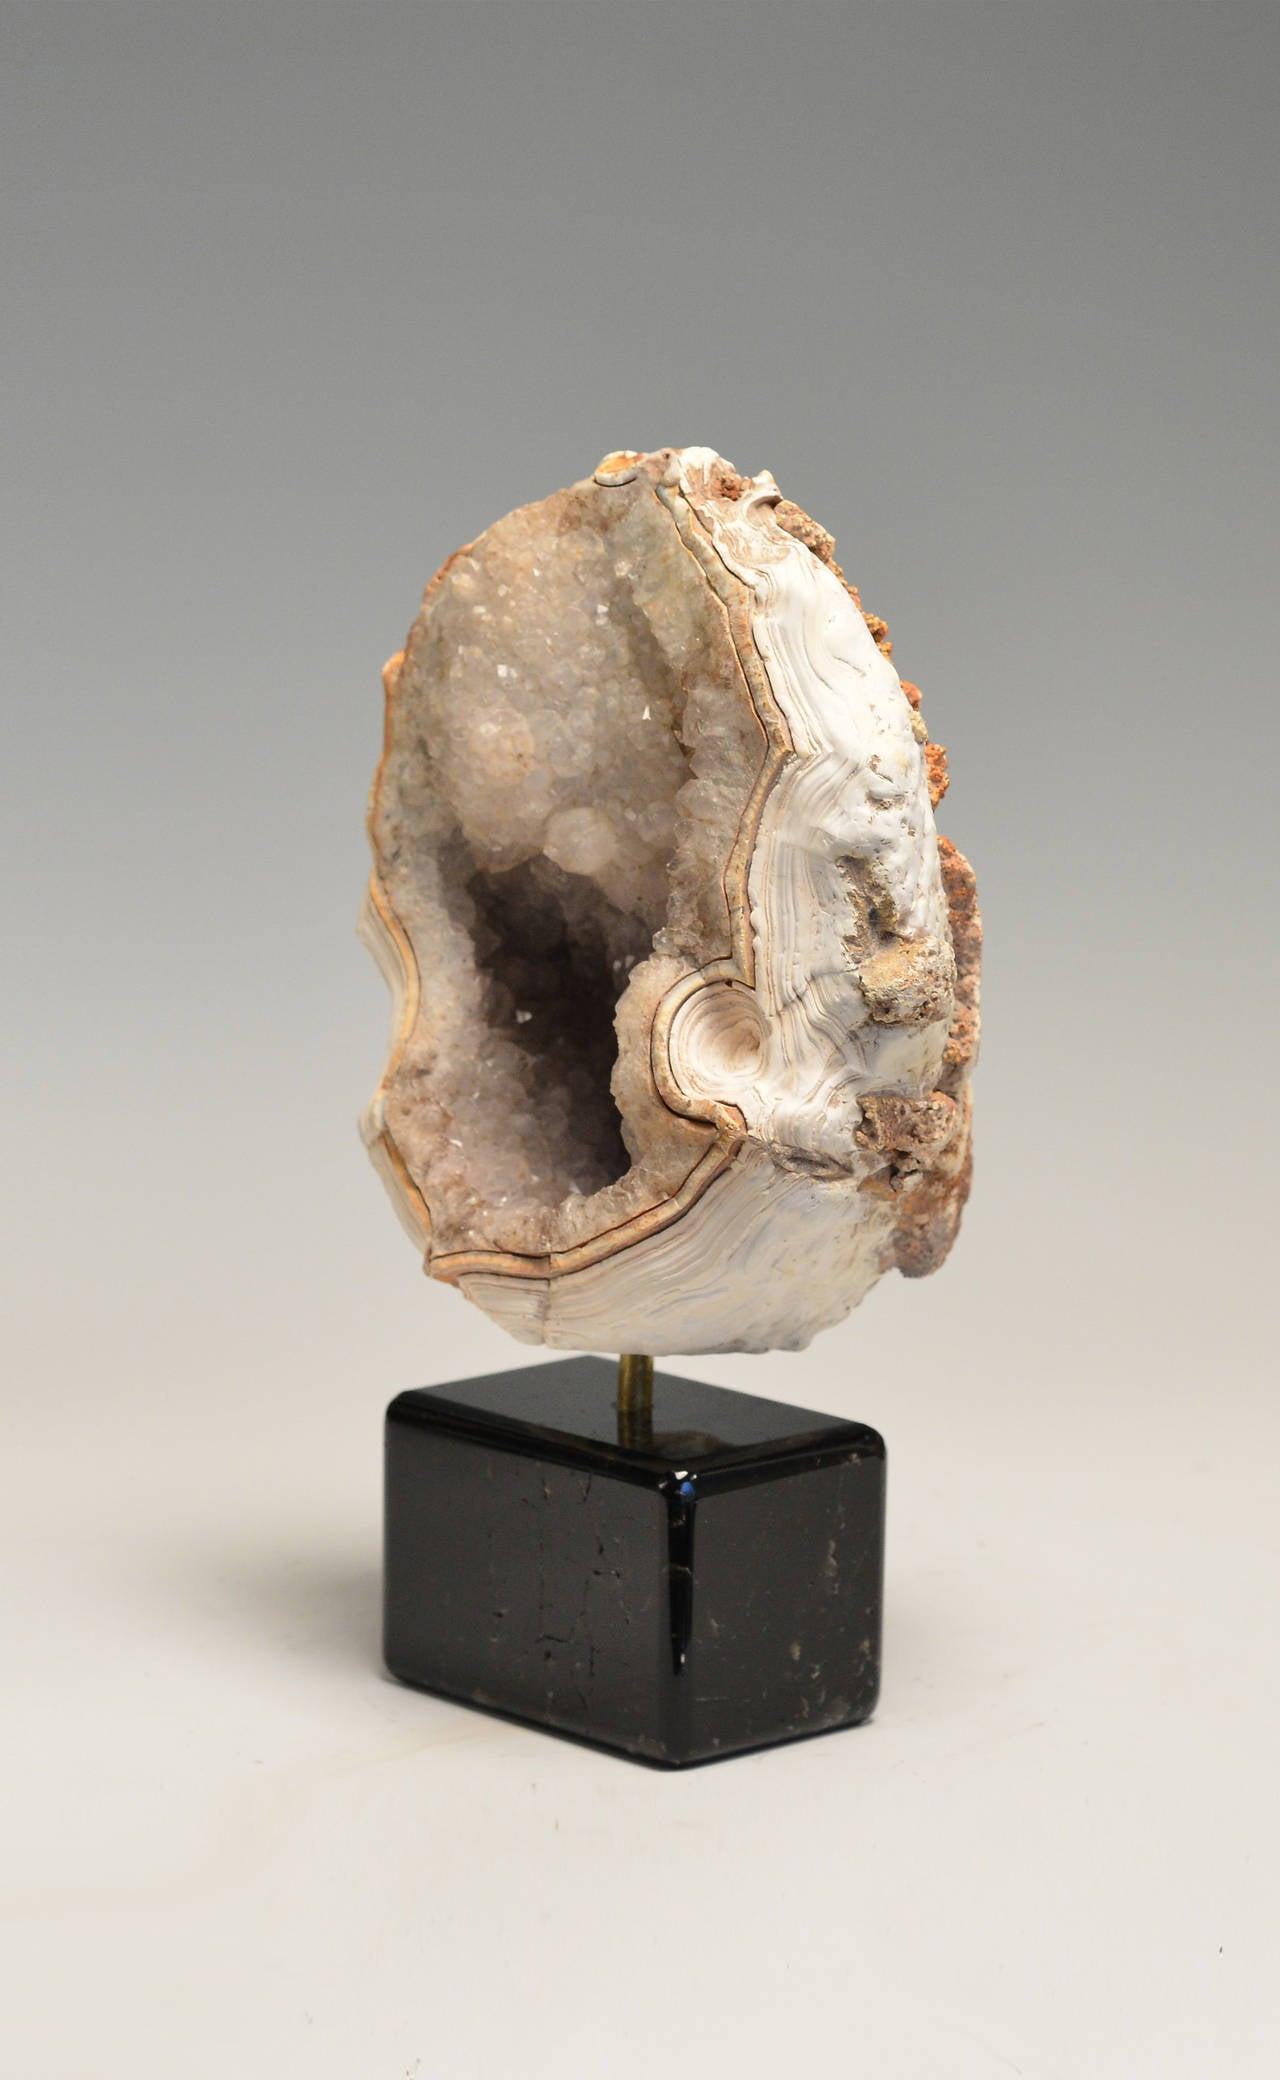 Quartz Geode With Dark Brown Rock Crystal Base For Sale At